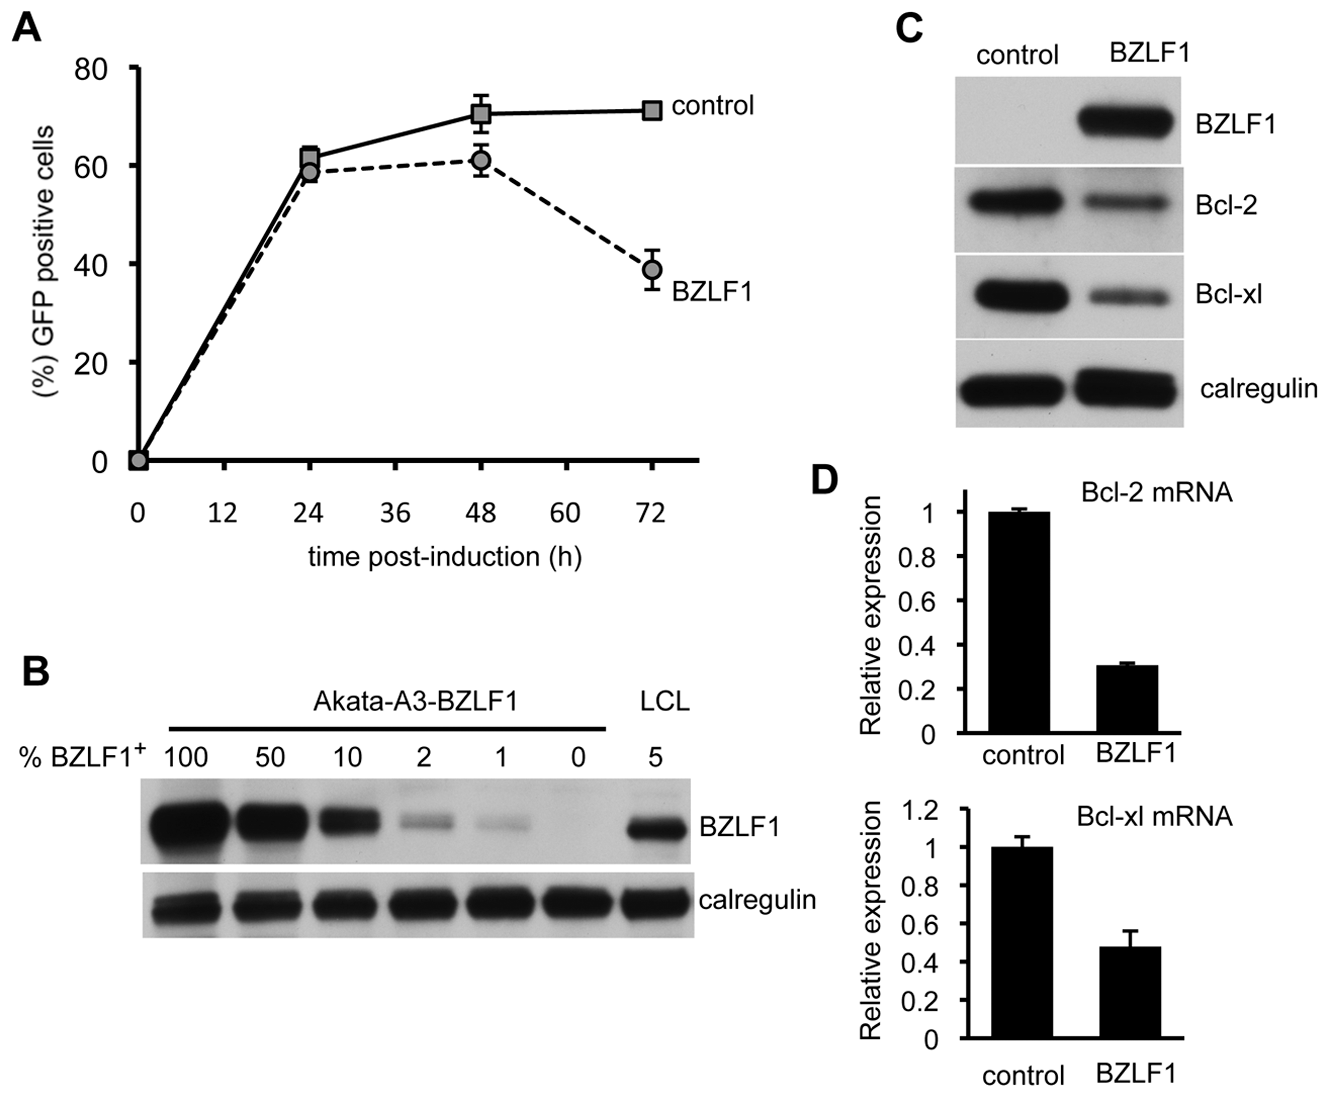 BZLF1 downregulates Bcl-2 family members.